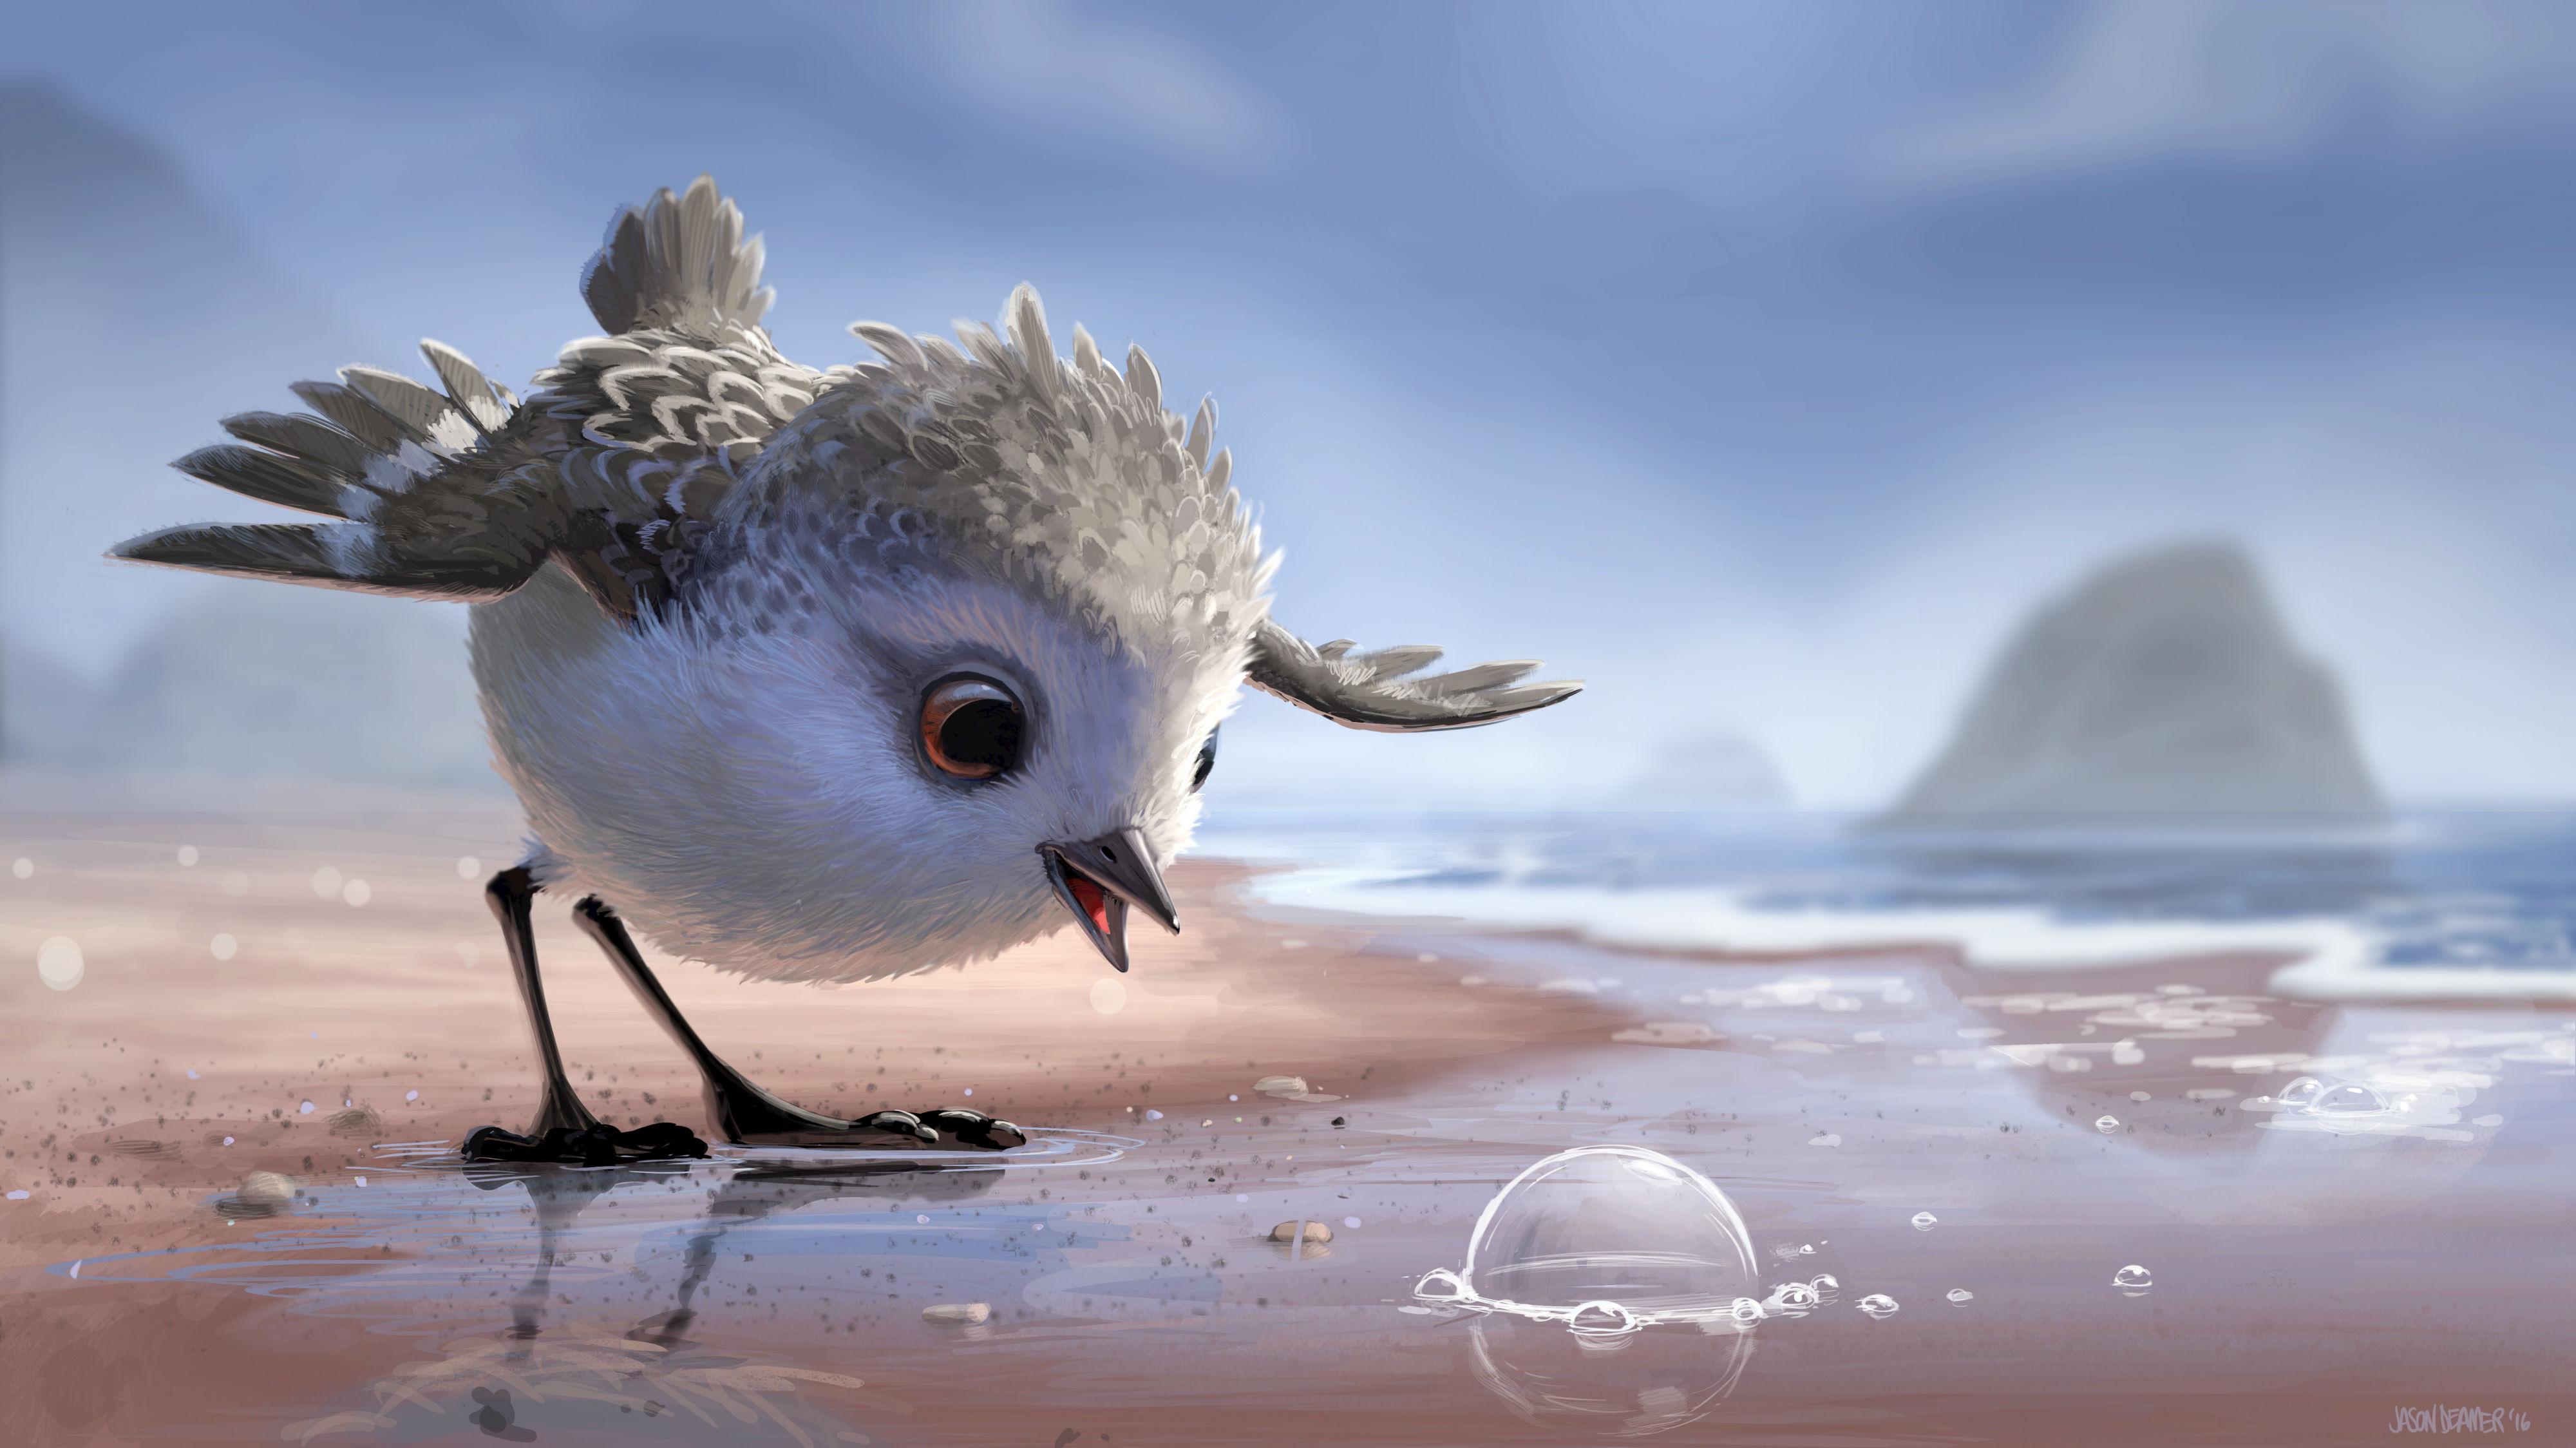 First Look at Pixar's Short Film 'Piper'